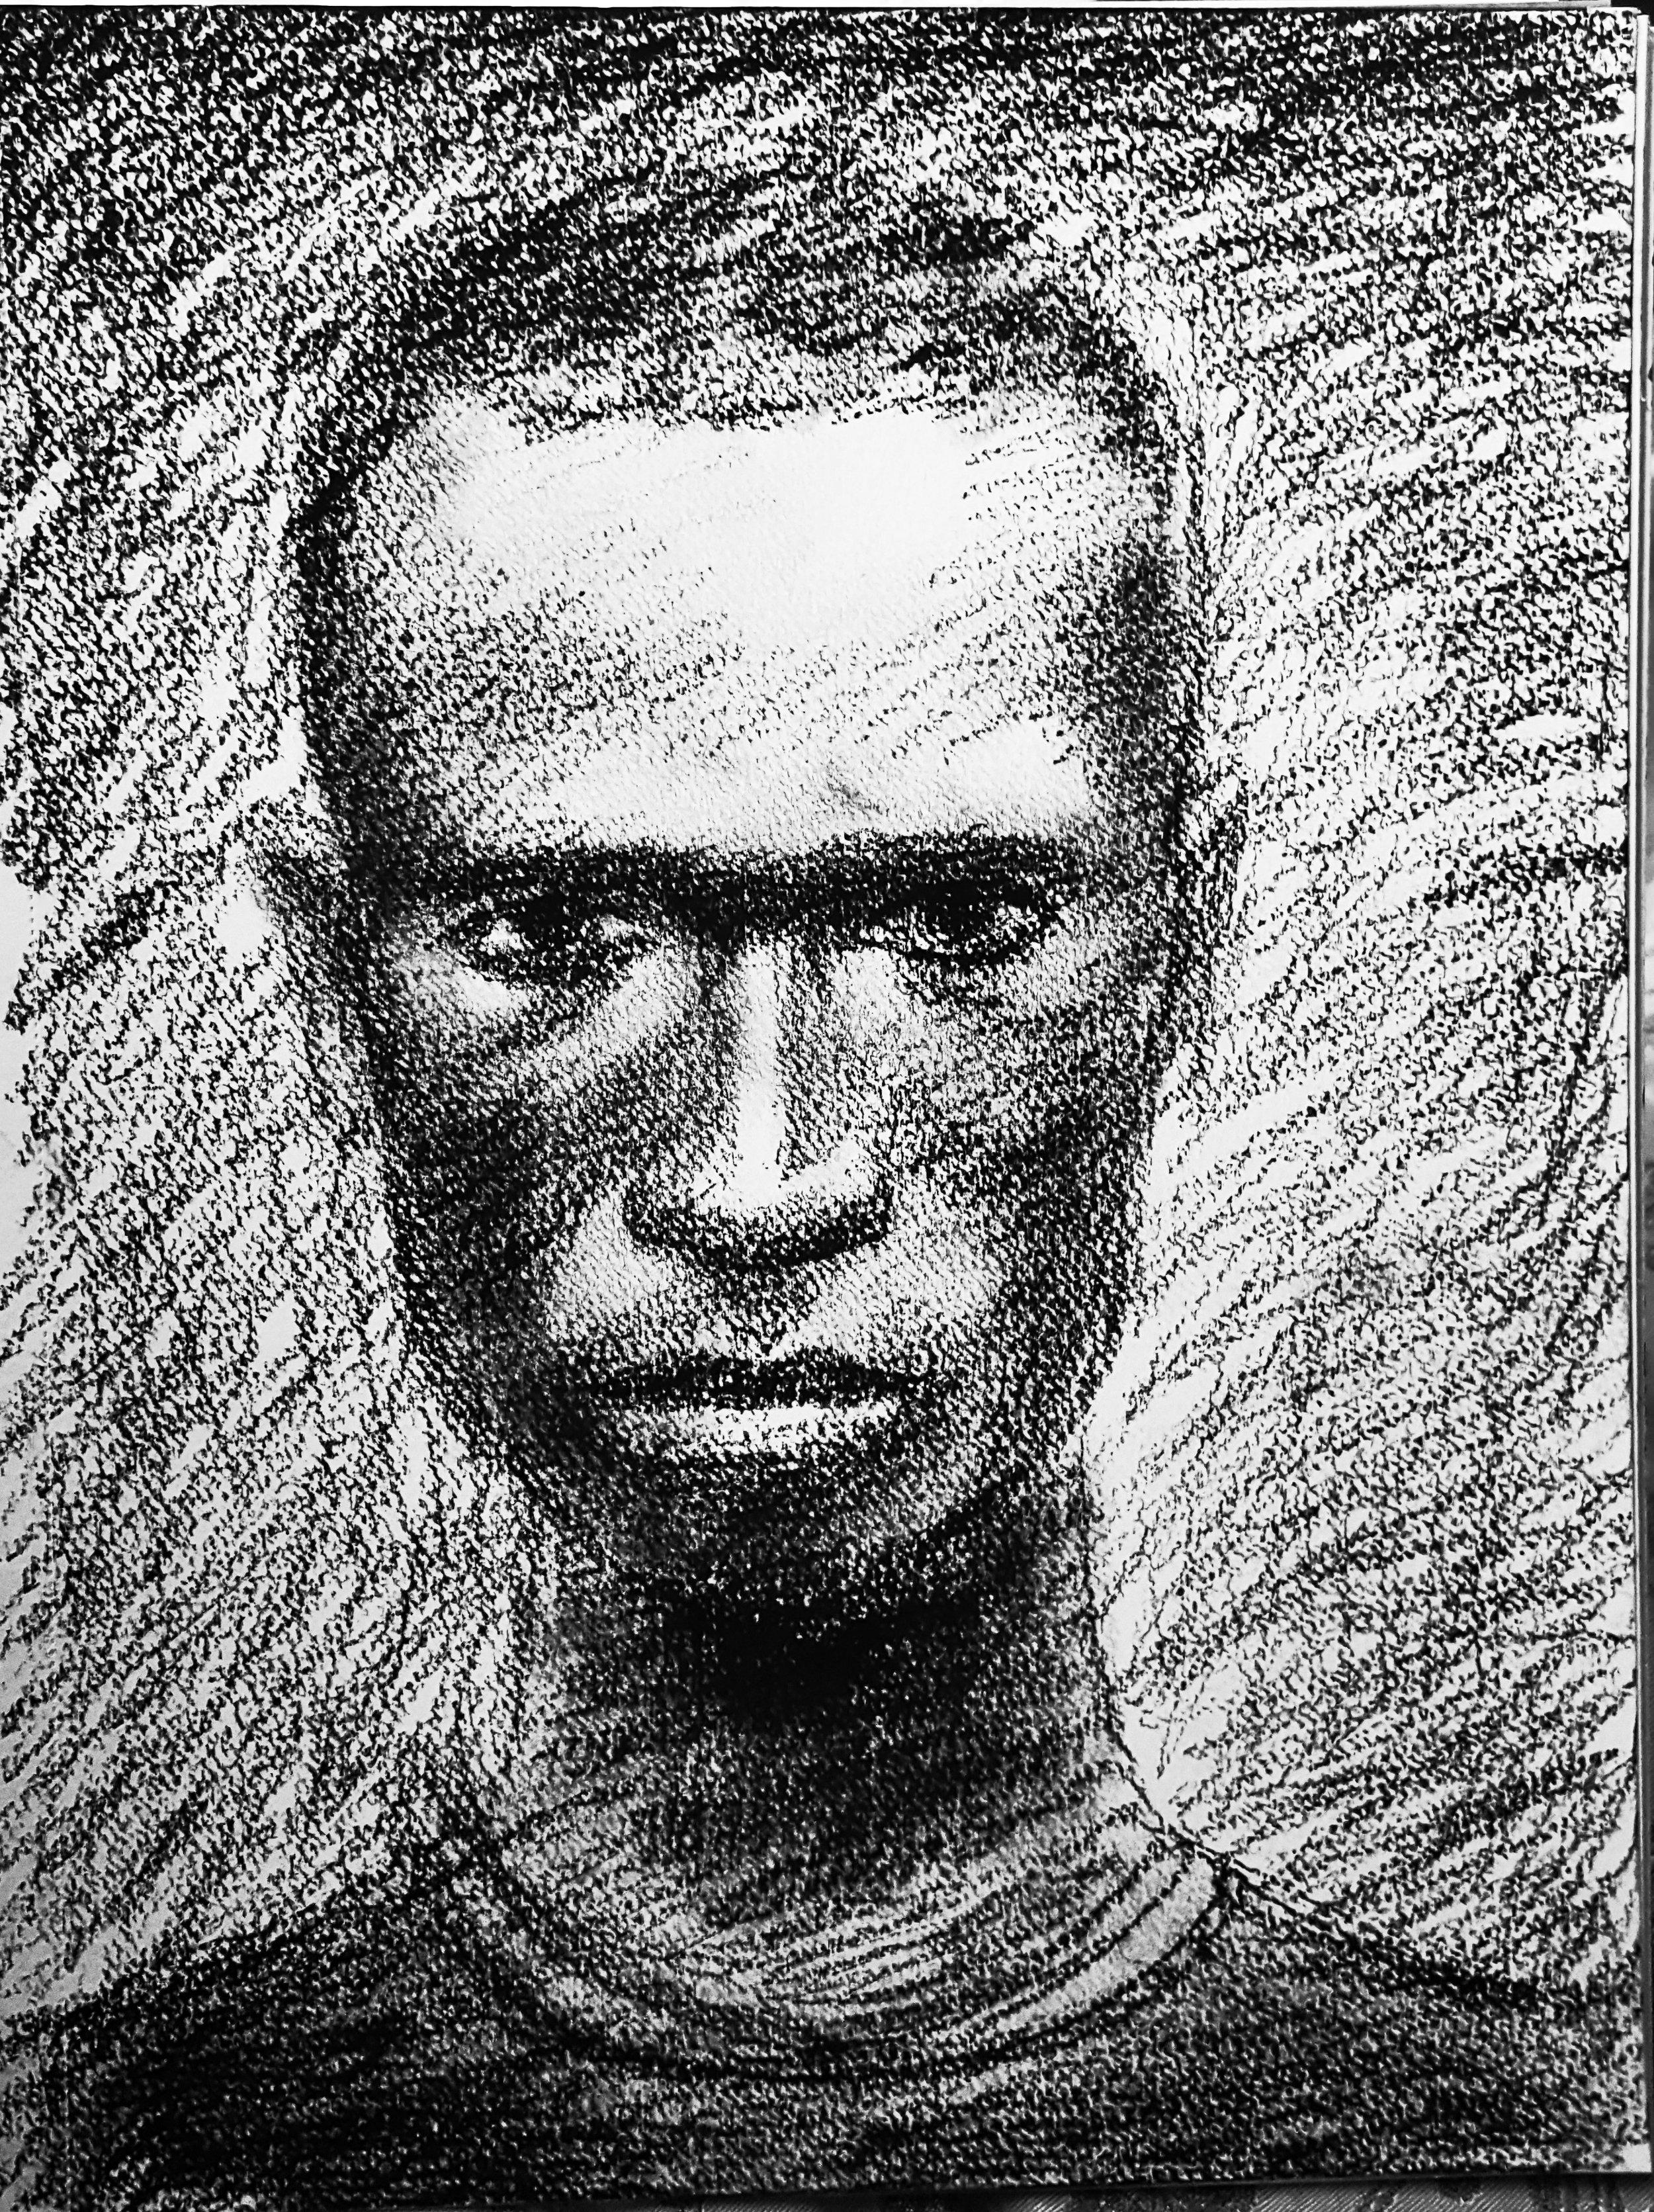 Drawing_Charcoal_3_edited.jpg